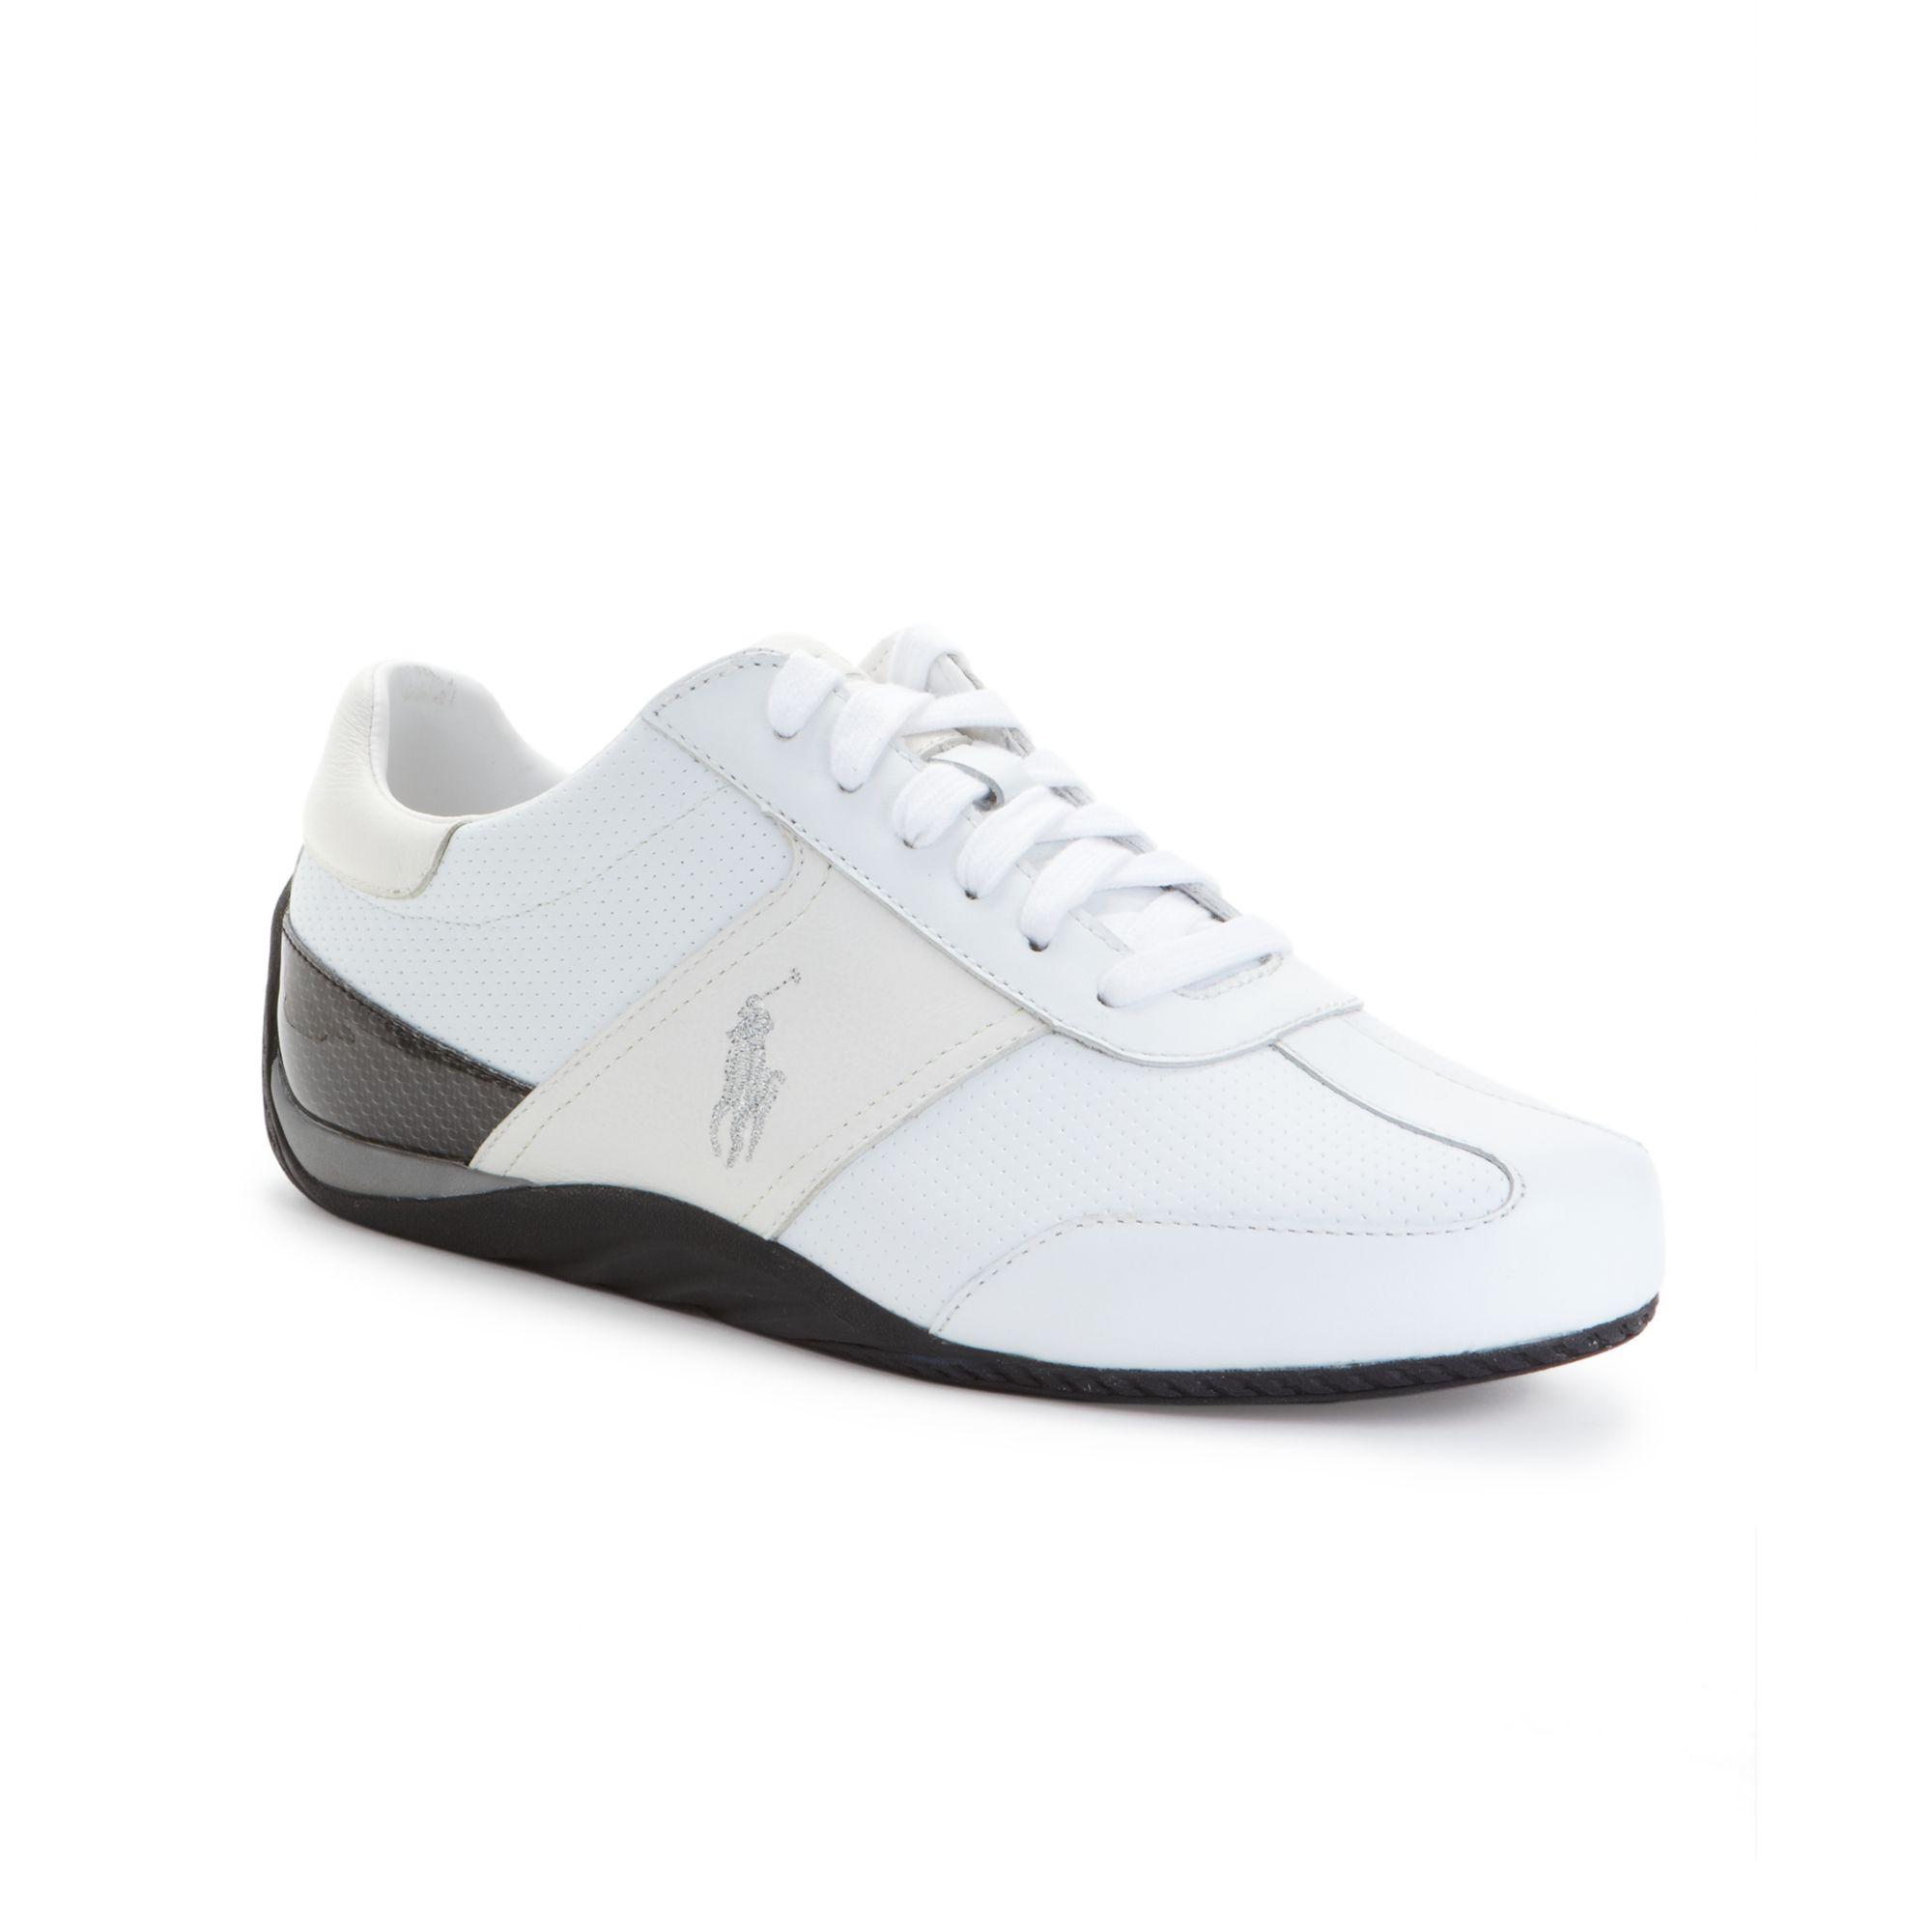 ralph lauren bentwinds sneakers in white for men lyst. Black Bedroom Furniture Sets. Home Design Ideas